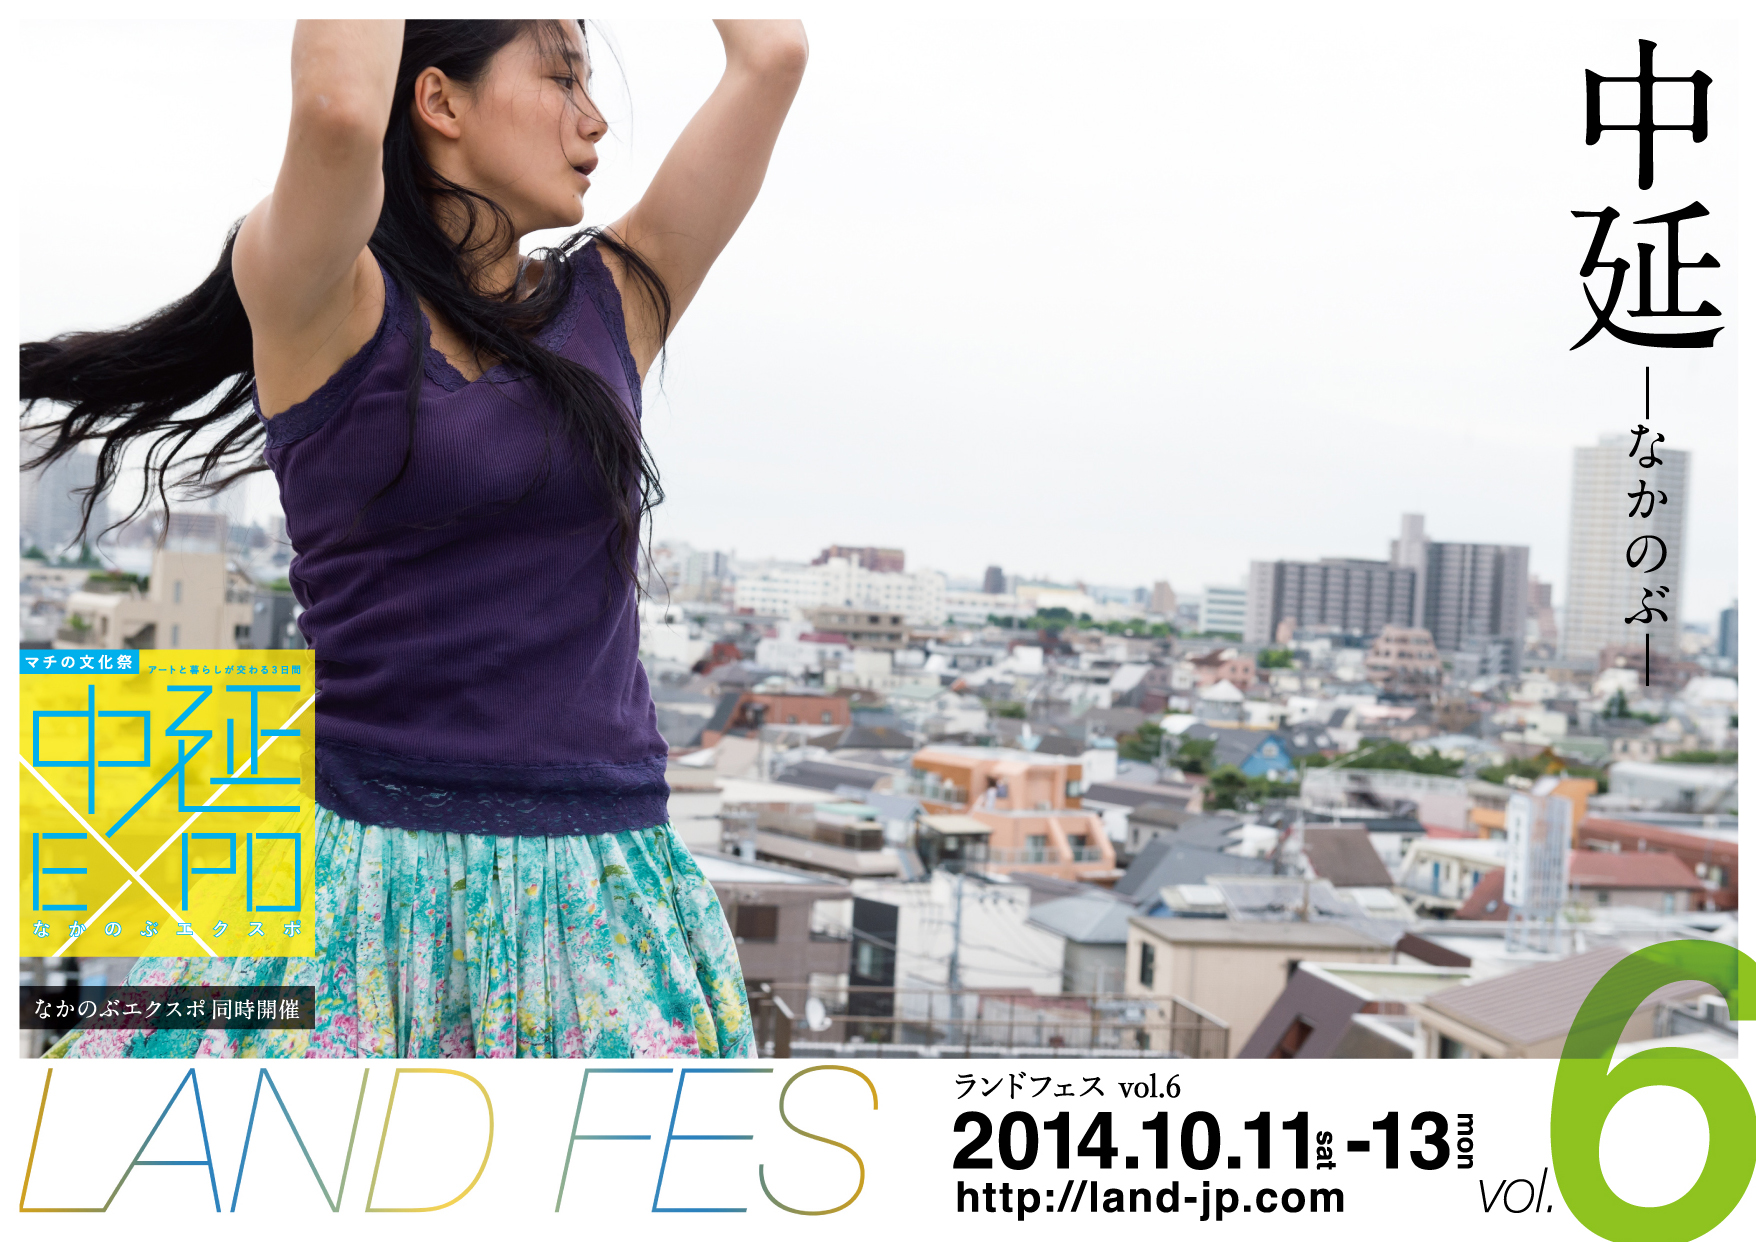 LandFes_vol.06_Flier-01